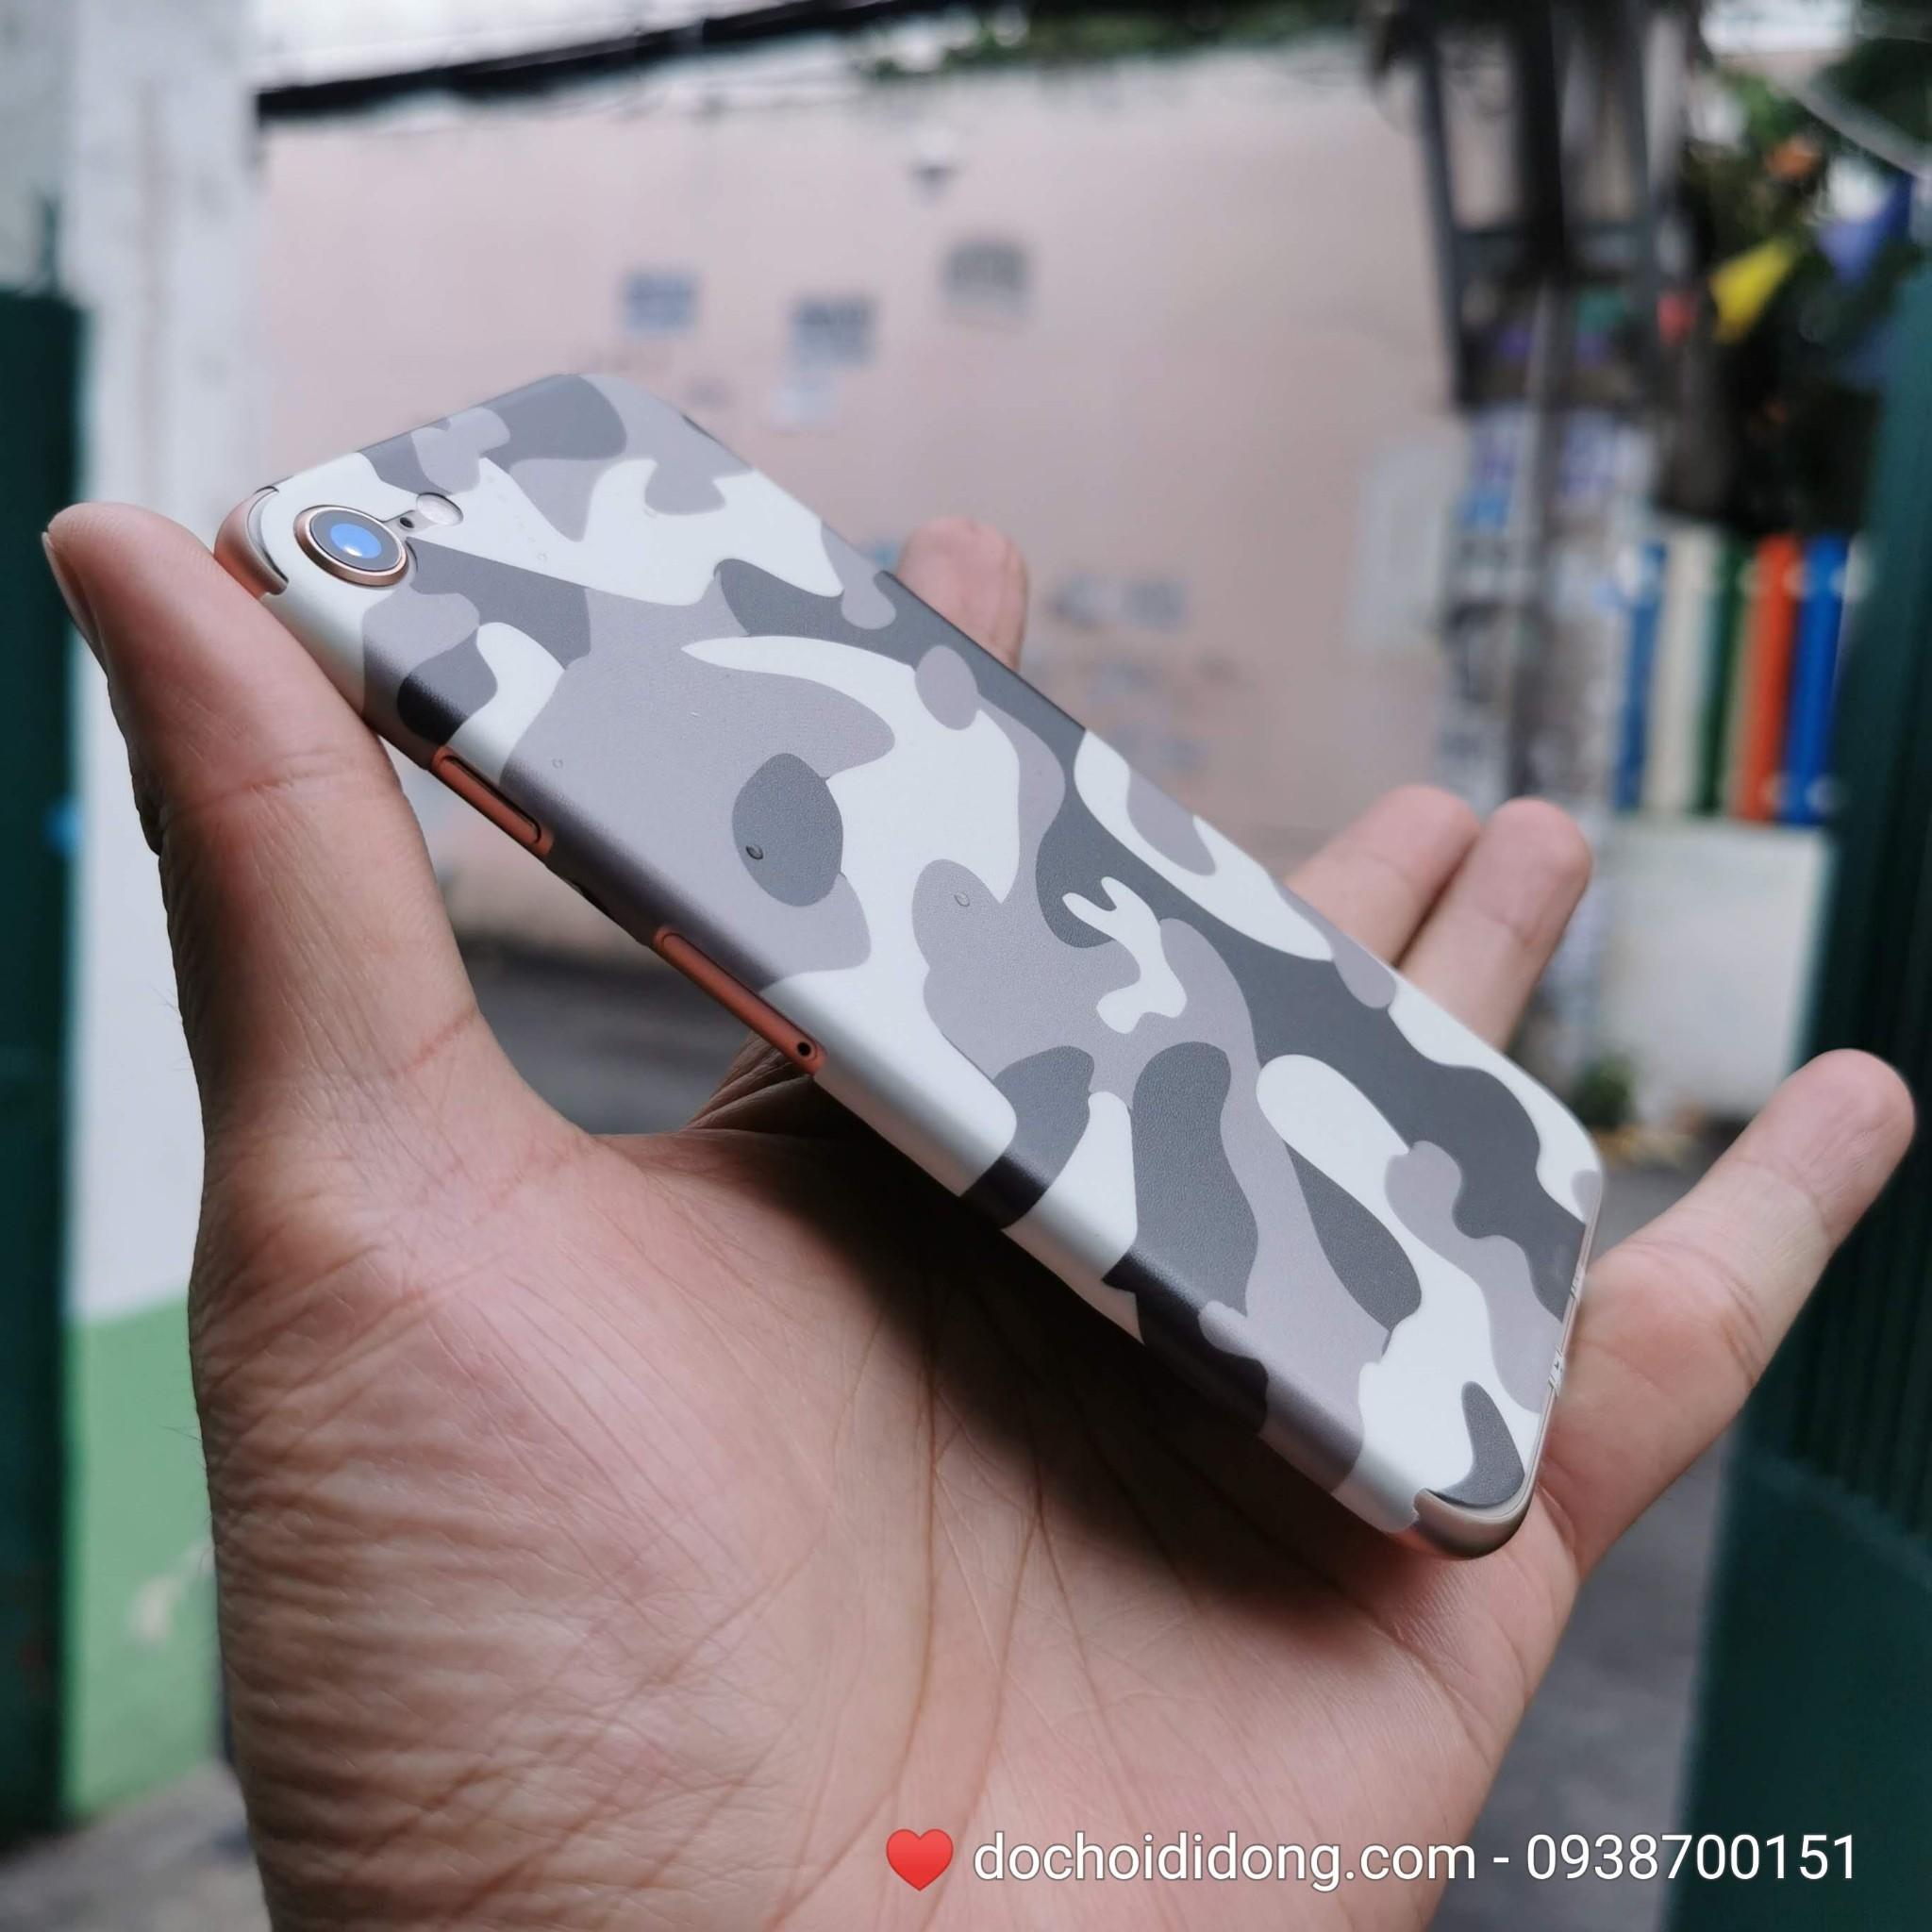 mieng-dan-ppf-rock-iphone-8-trong-nham-doi-mau-cao-cap